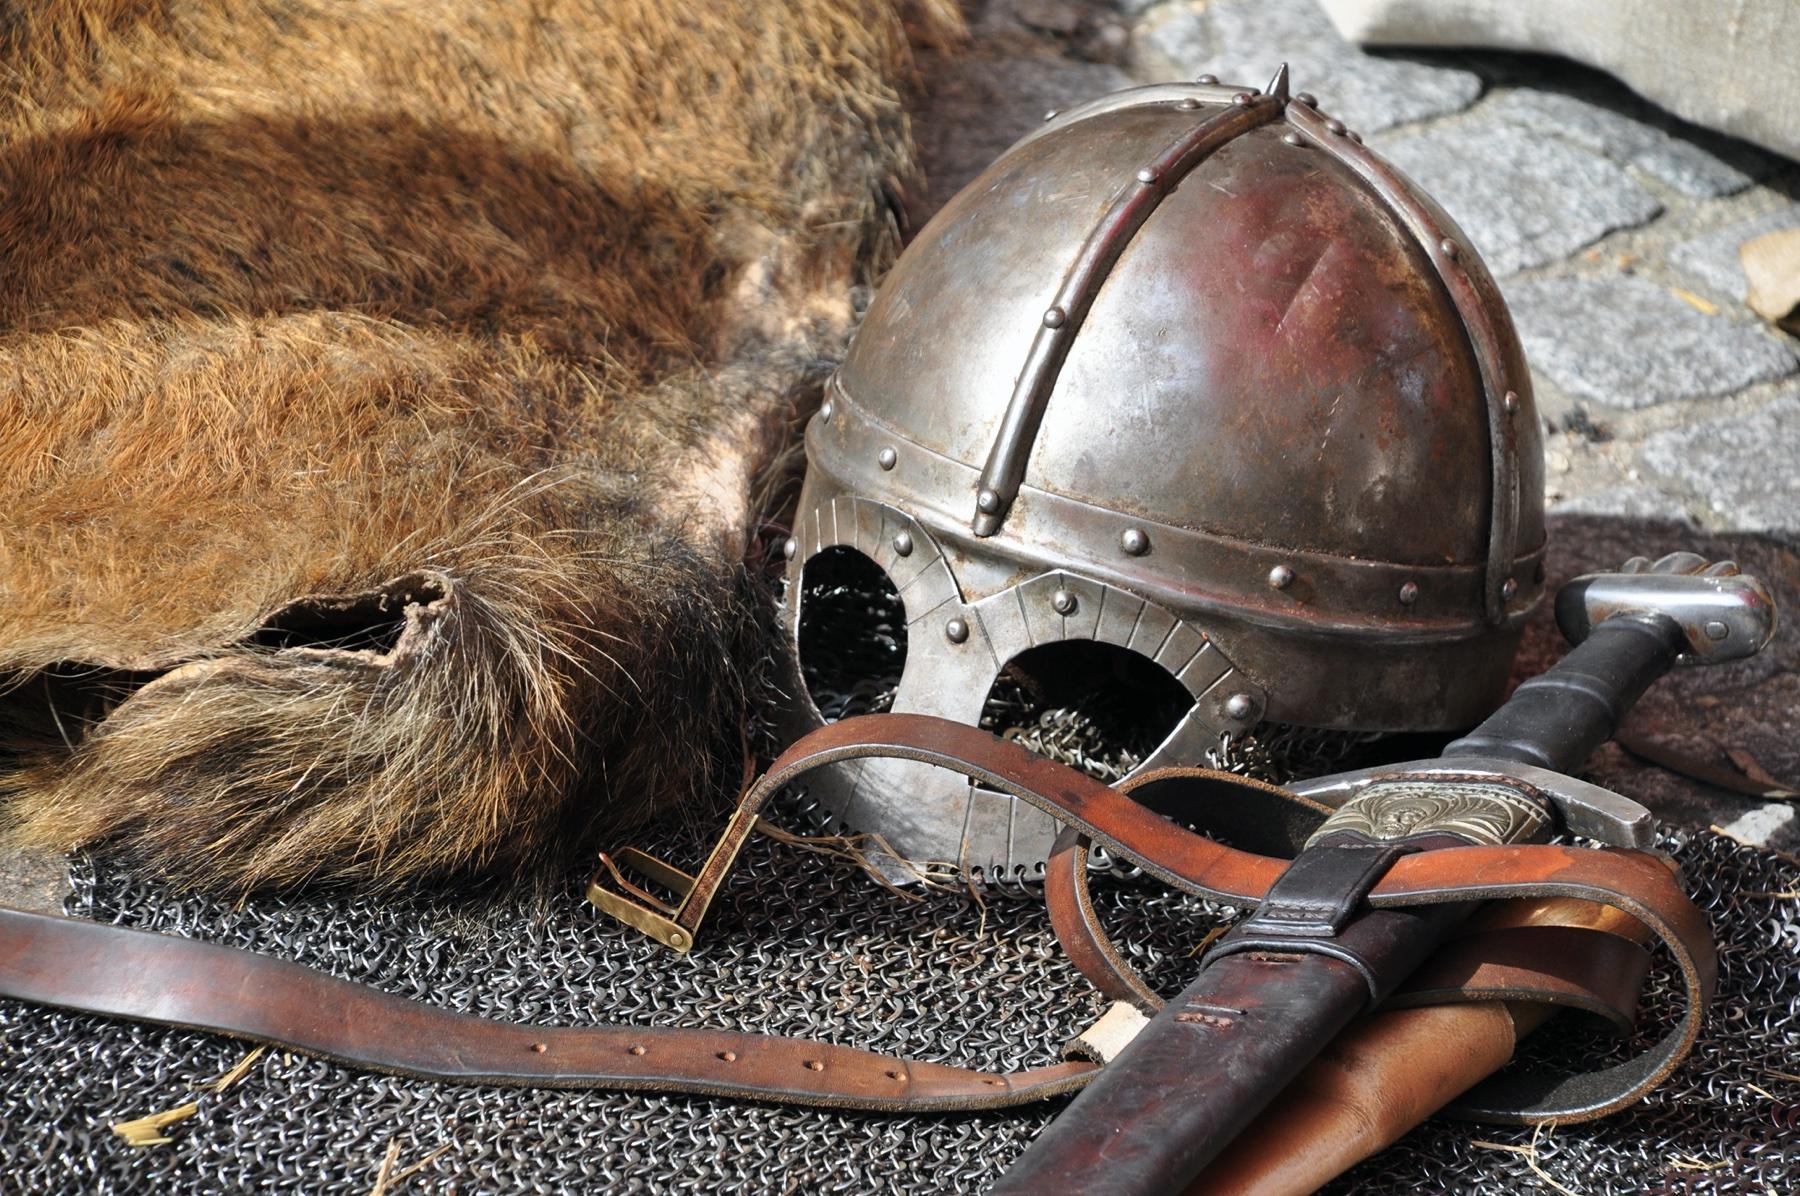 knight-1421358